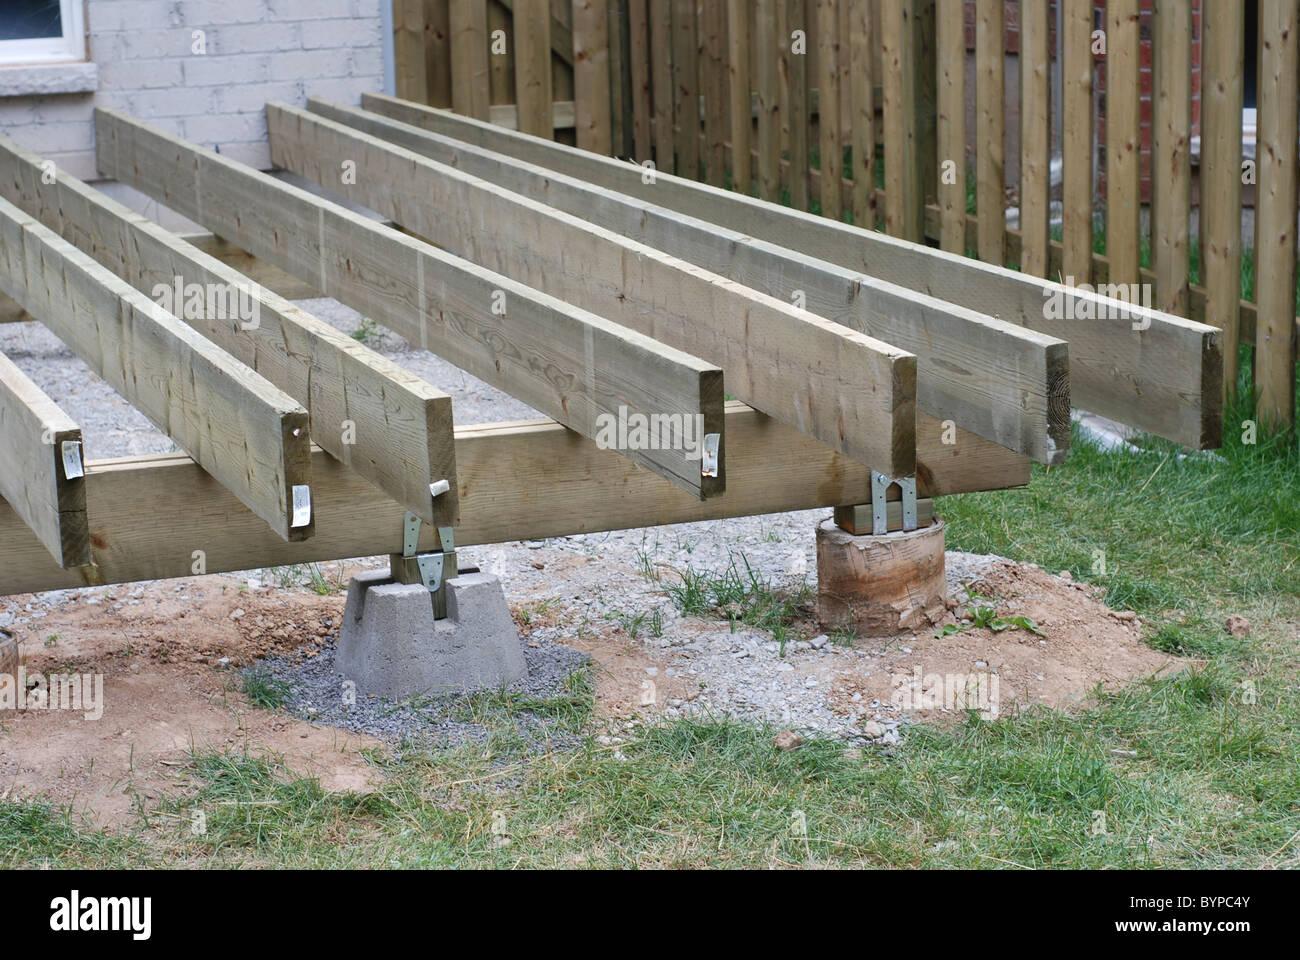 Deck construction Stock Photo 34298571  Alamy